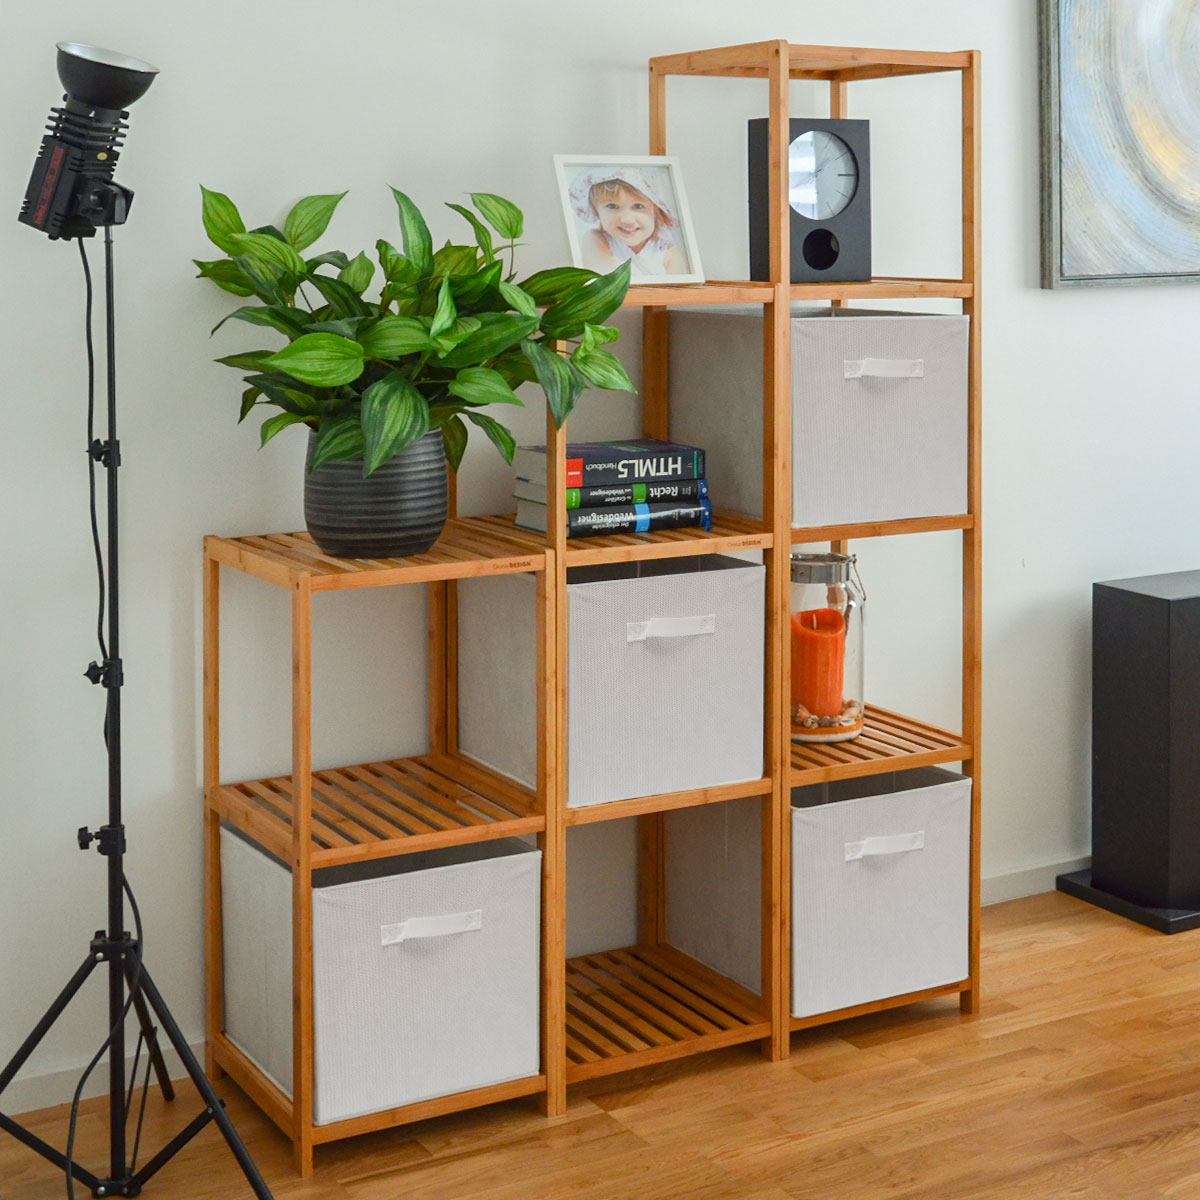 faltbox set 4 boxen f r kallax regal wei 33x38x33cm. Black Bedroom Furniture Sets. Home Design Ideas